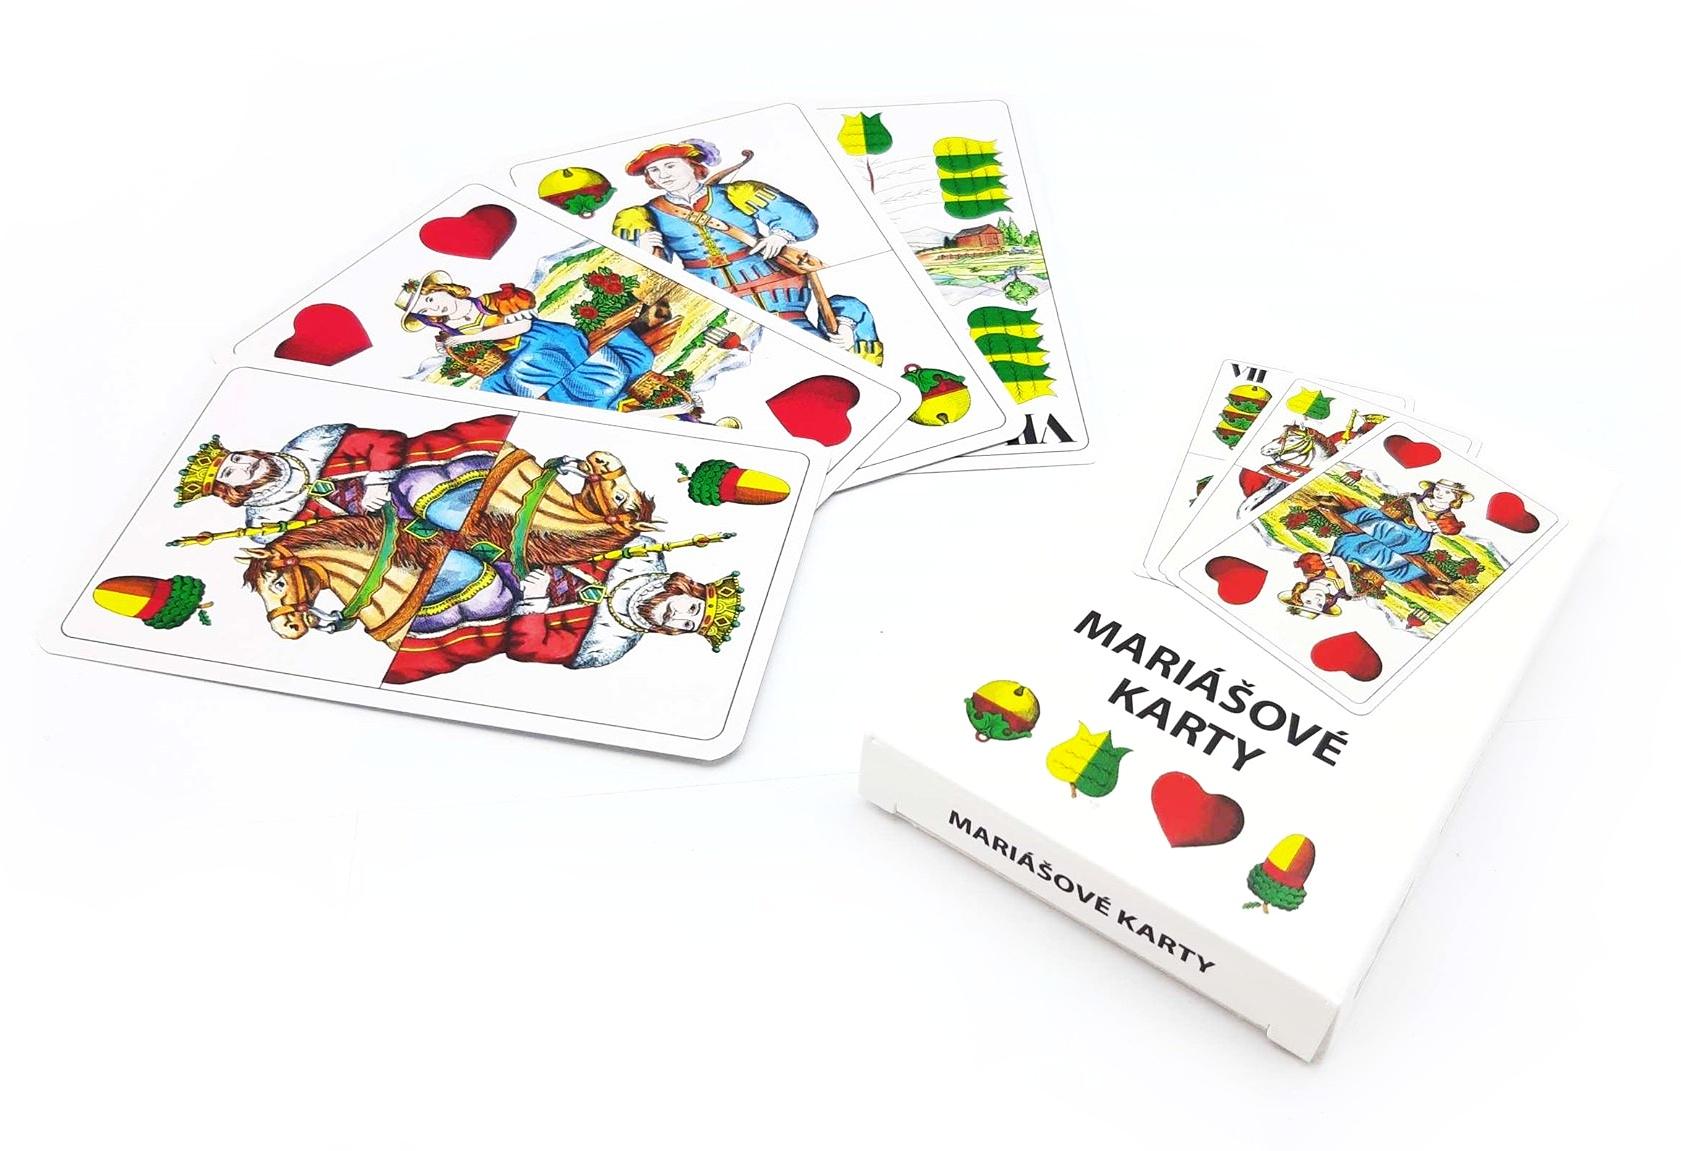 Mariášové karty papier